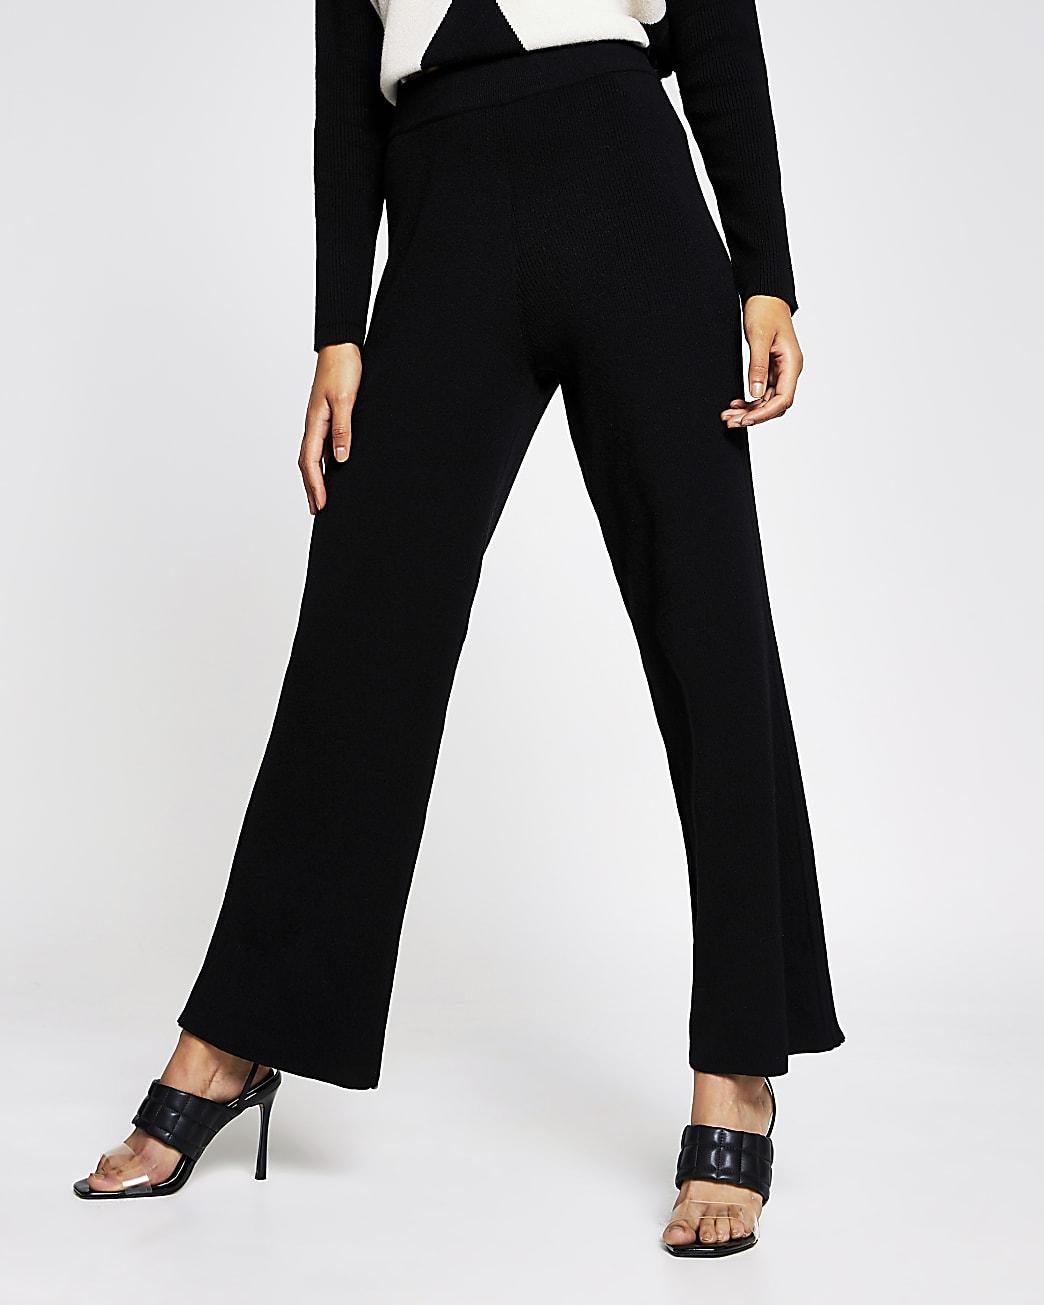 Black wide leg trouser